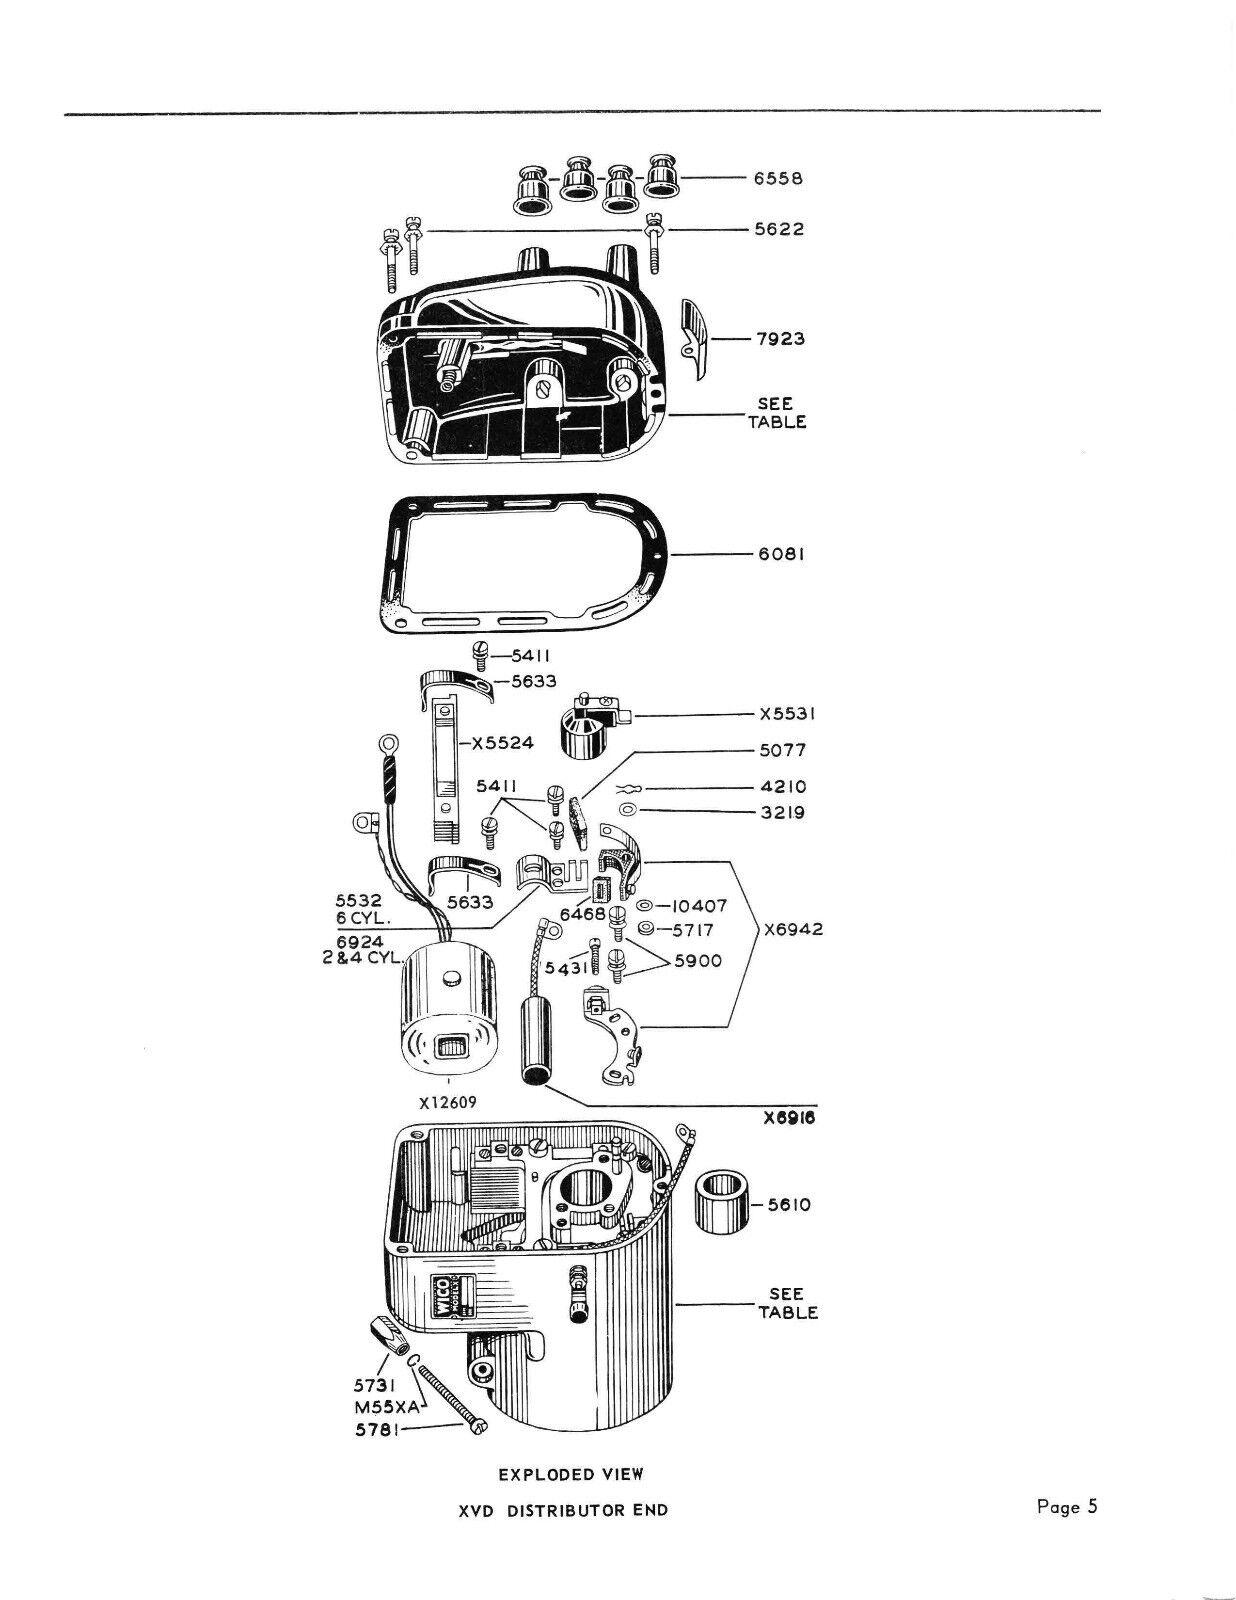 wico magneto service parts manual for xvd xve magnetos john rh picclick com Magneto Wiring Schematic Wu Pin E198635 Wiring Schematic